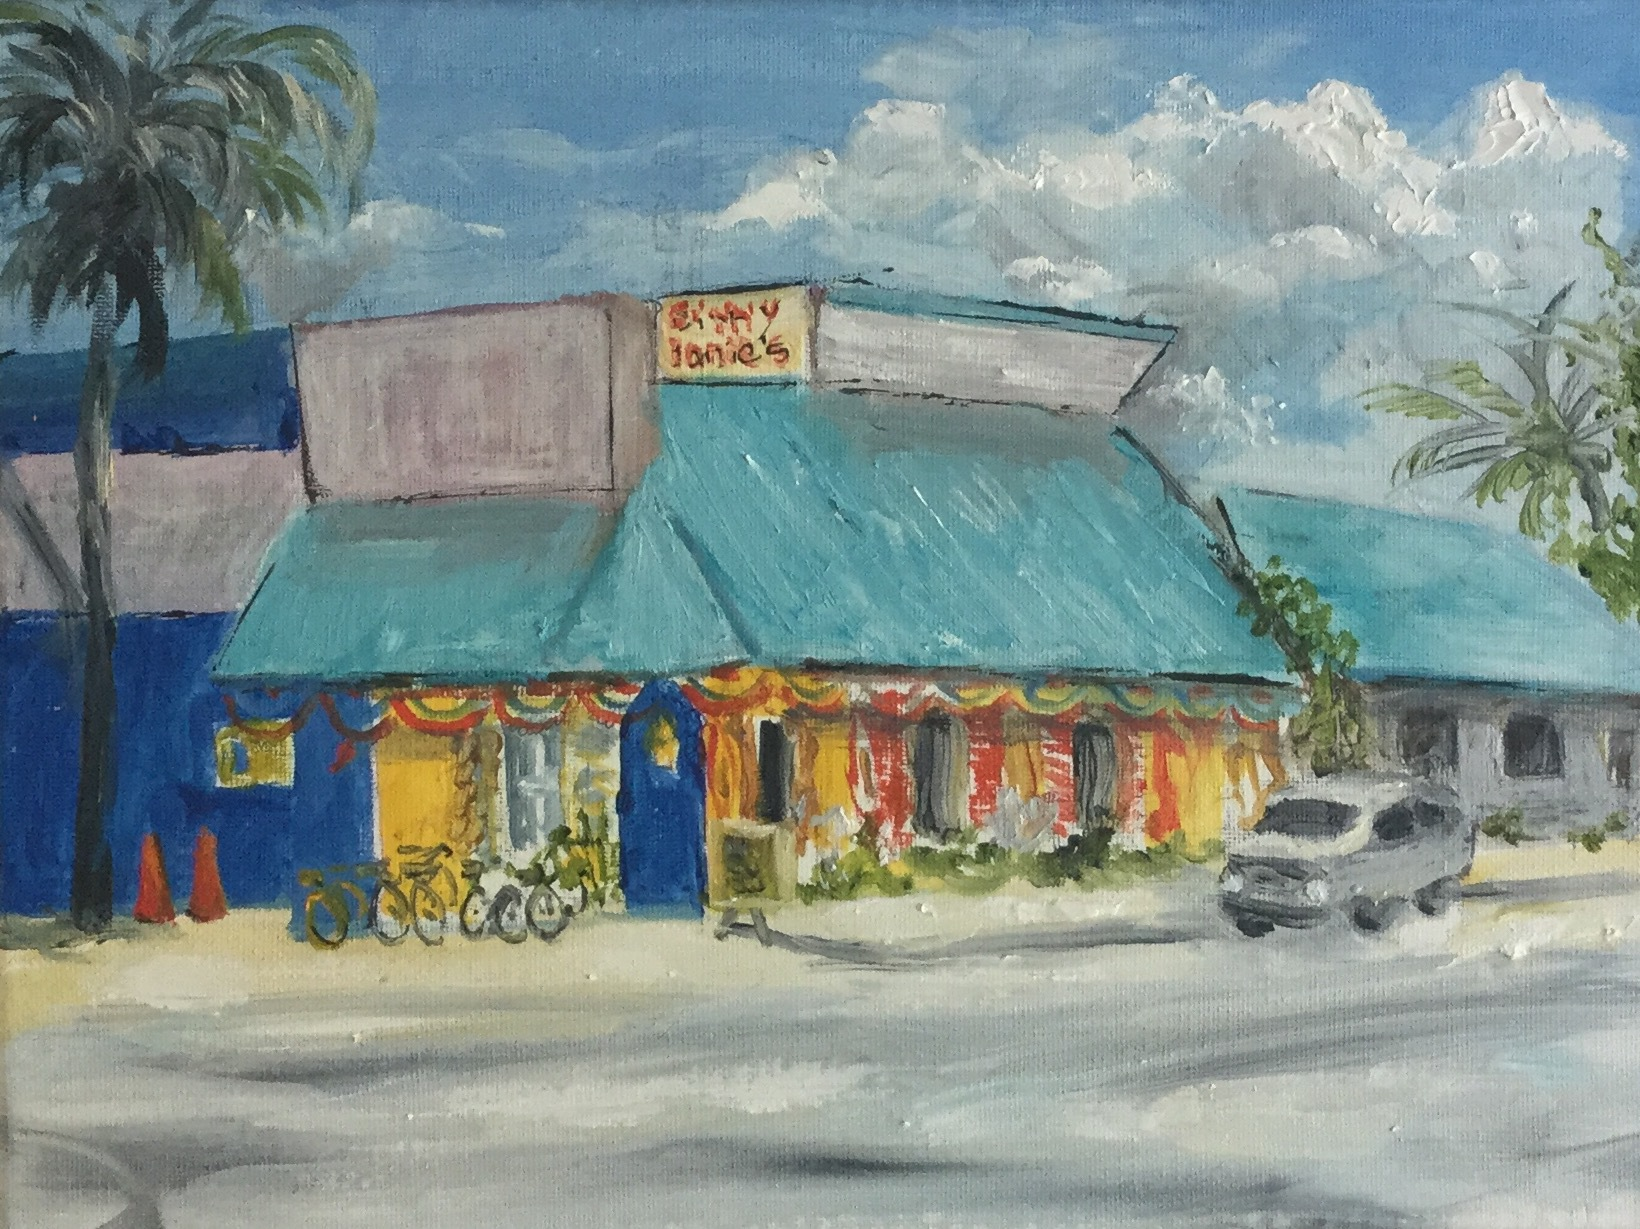 Ginny's and Jeanie's on Anna Maria Island